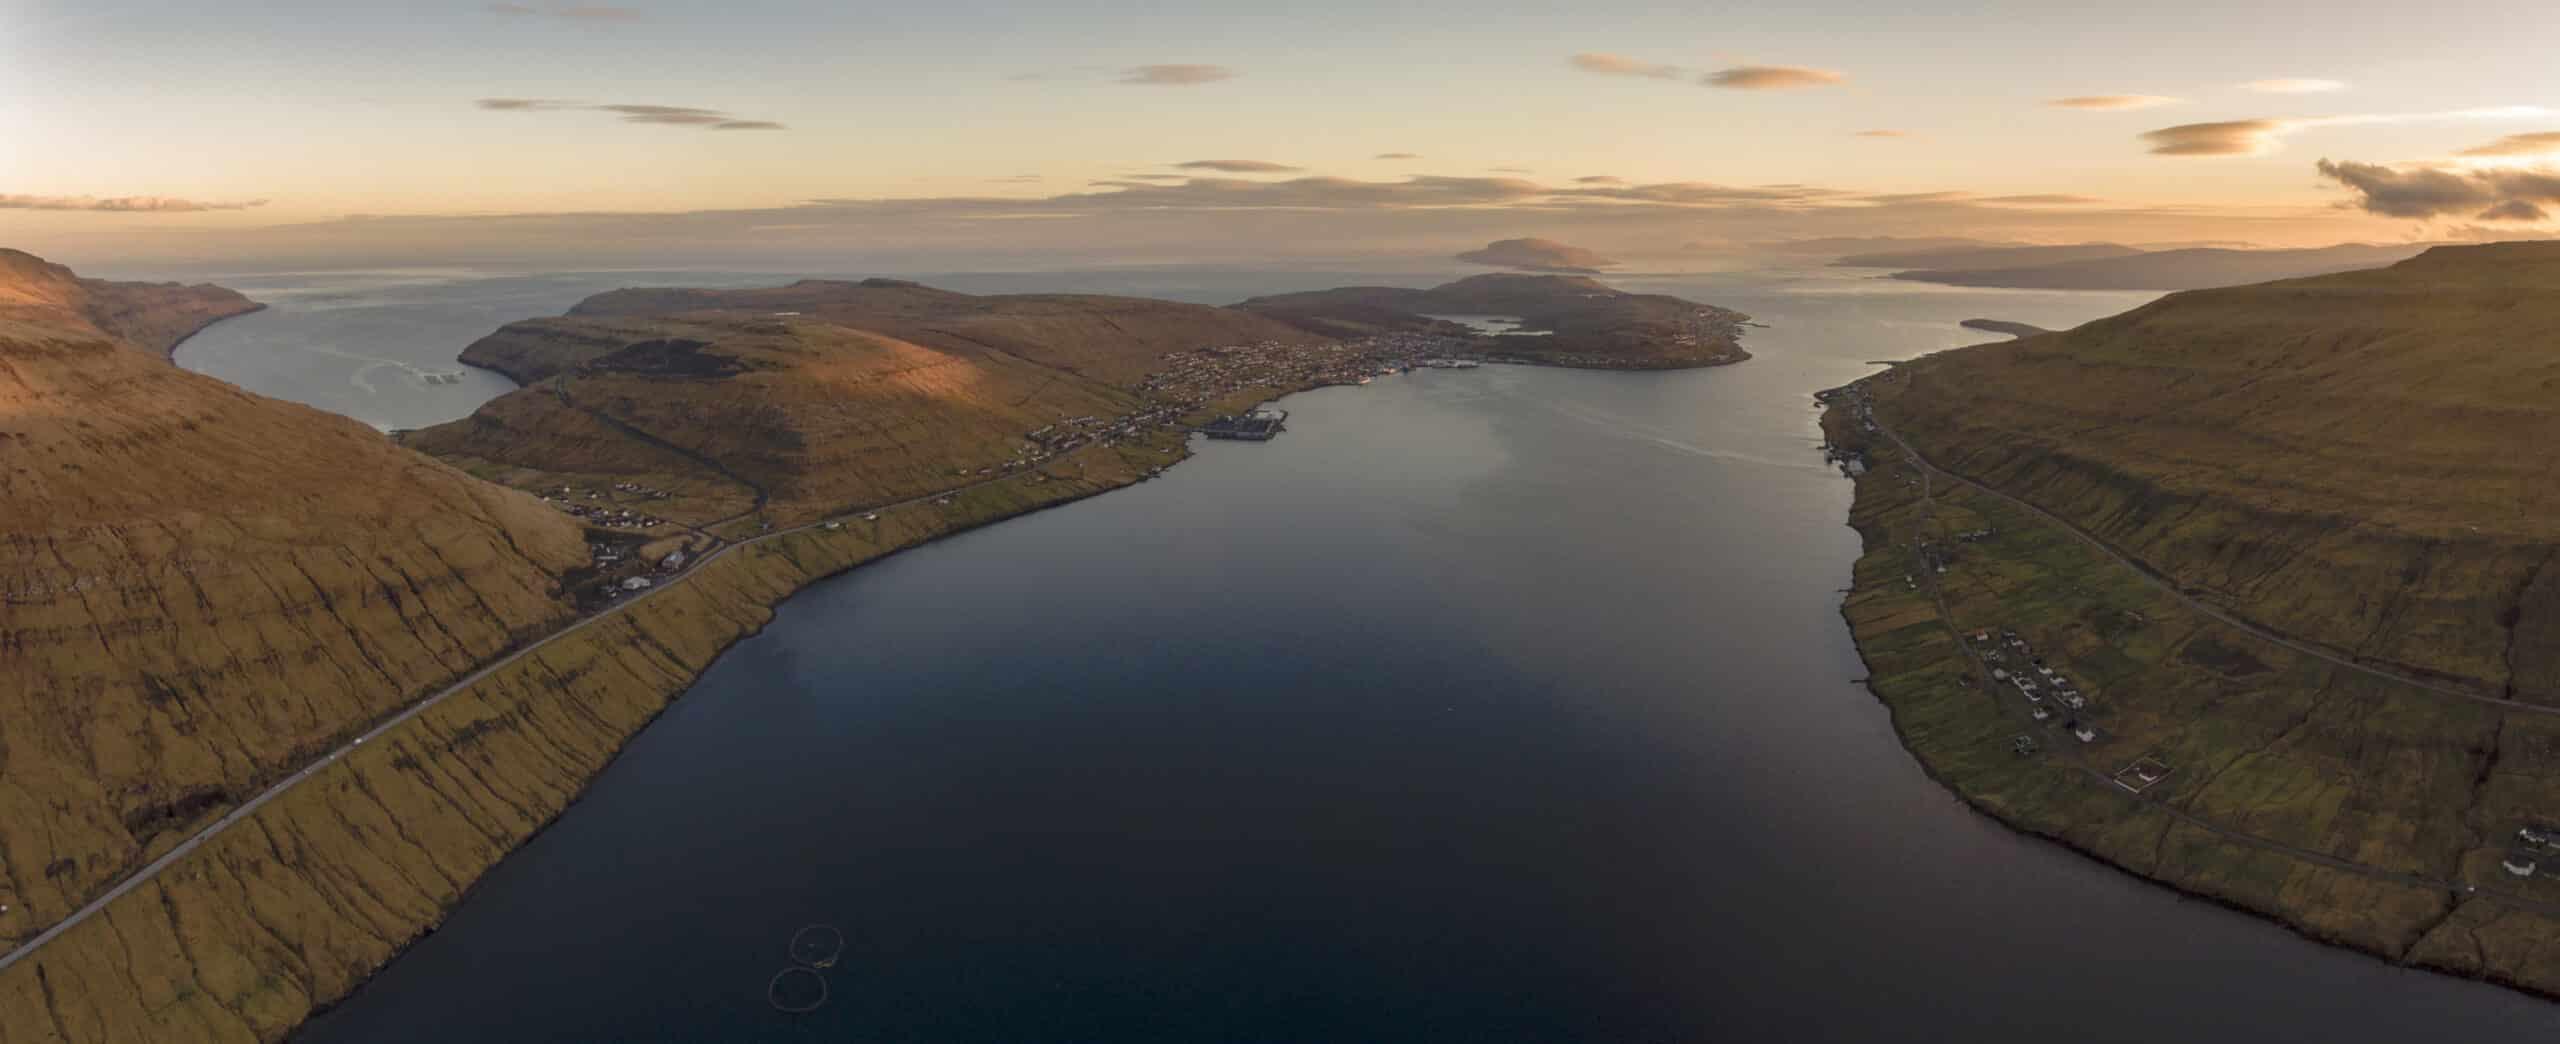 skálafjørðurin-guide-to-faroe-islands